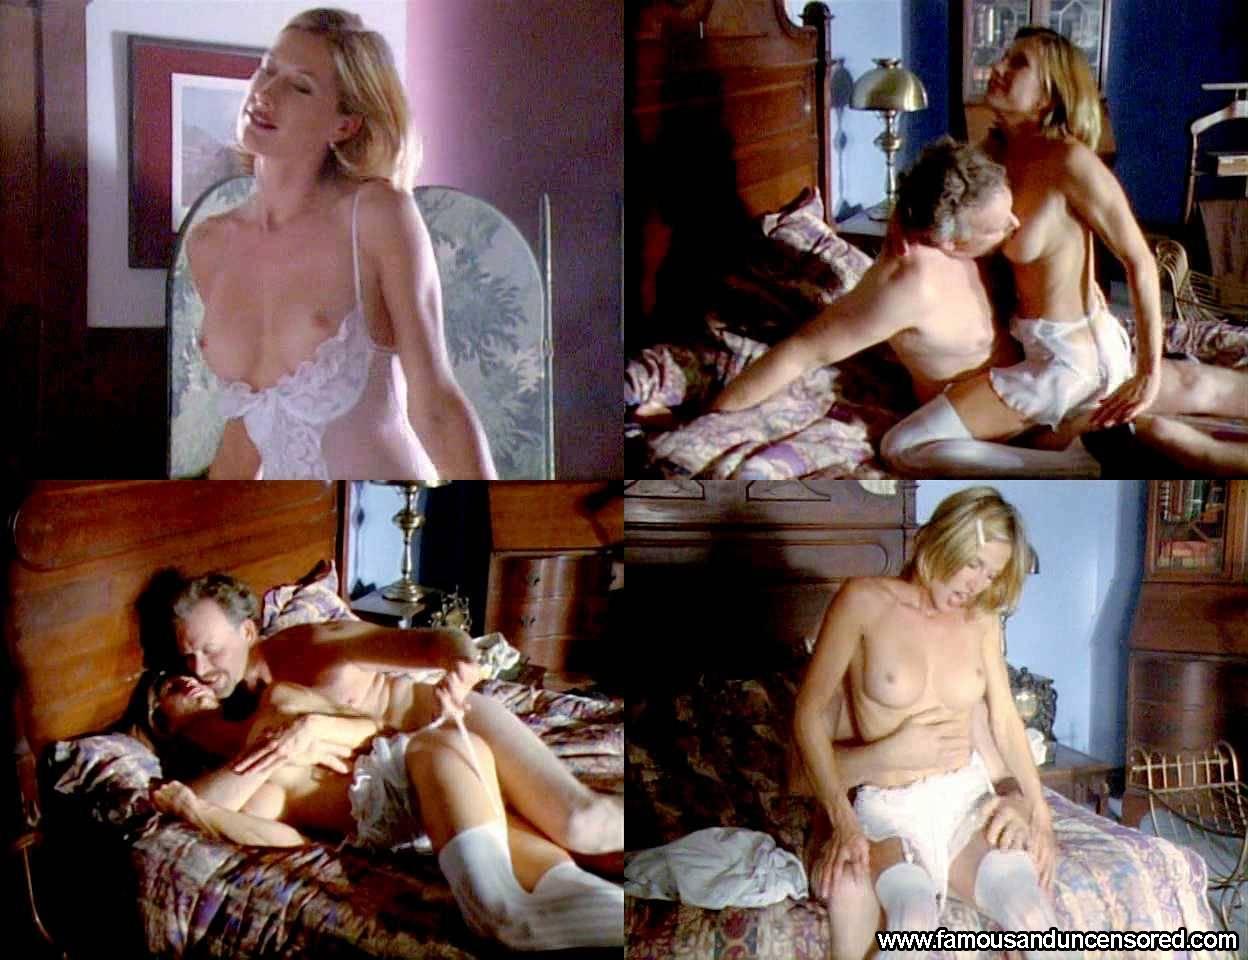 nude (64 photos), Paparazzi Celebrity photo